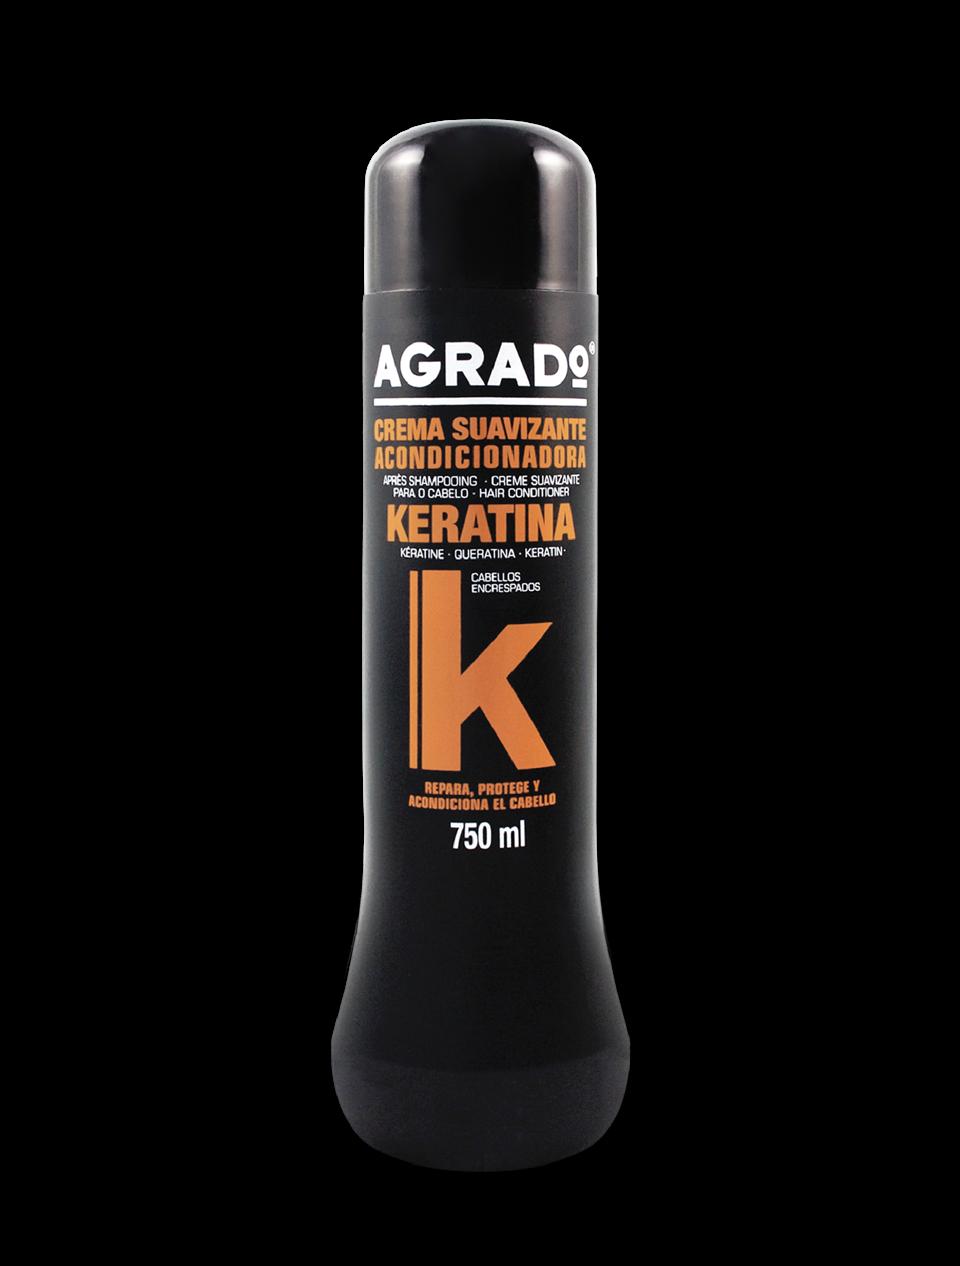 crema-suavizante-acondicionadora-keratina-agrado-4907